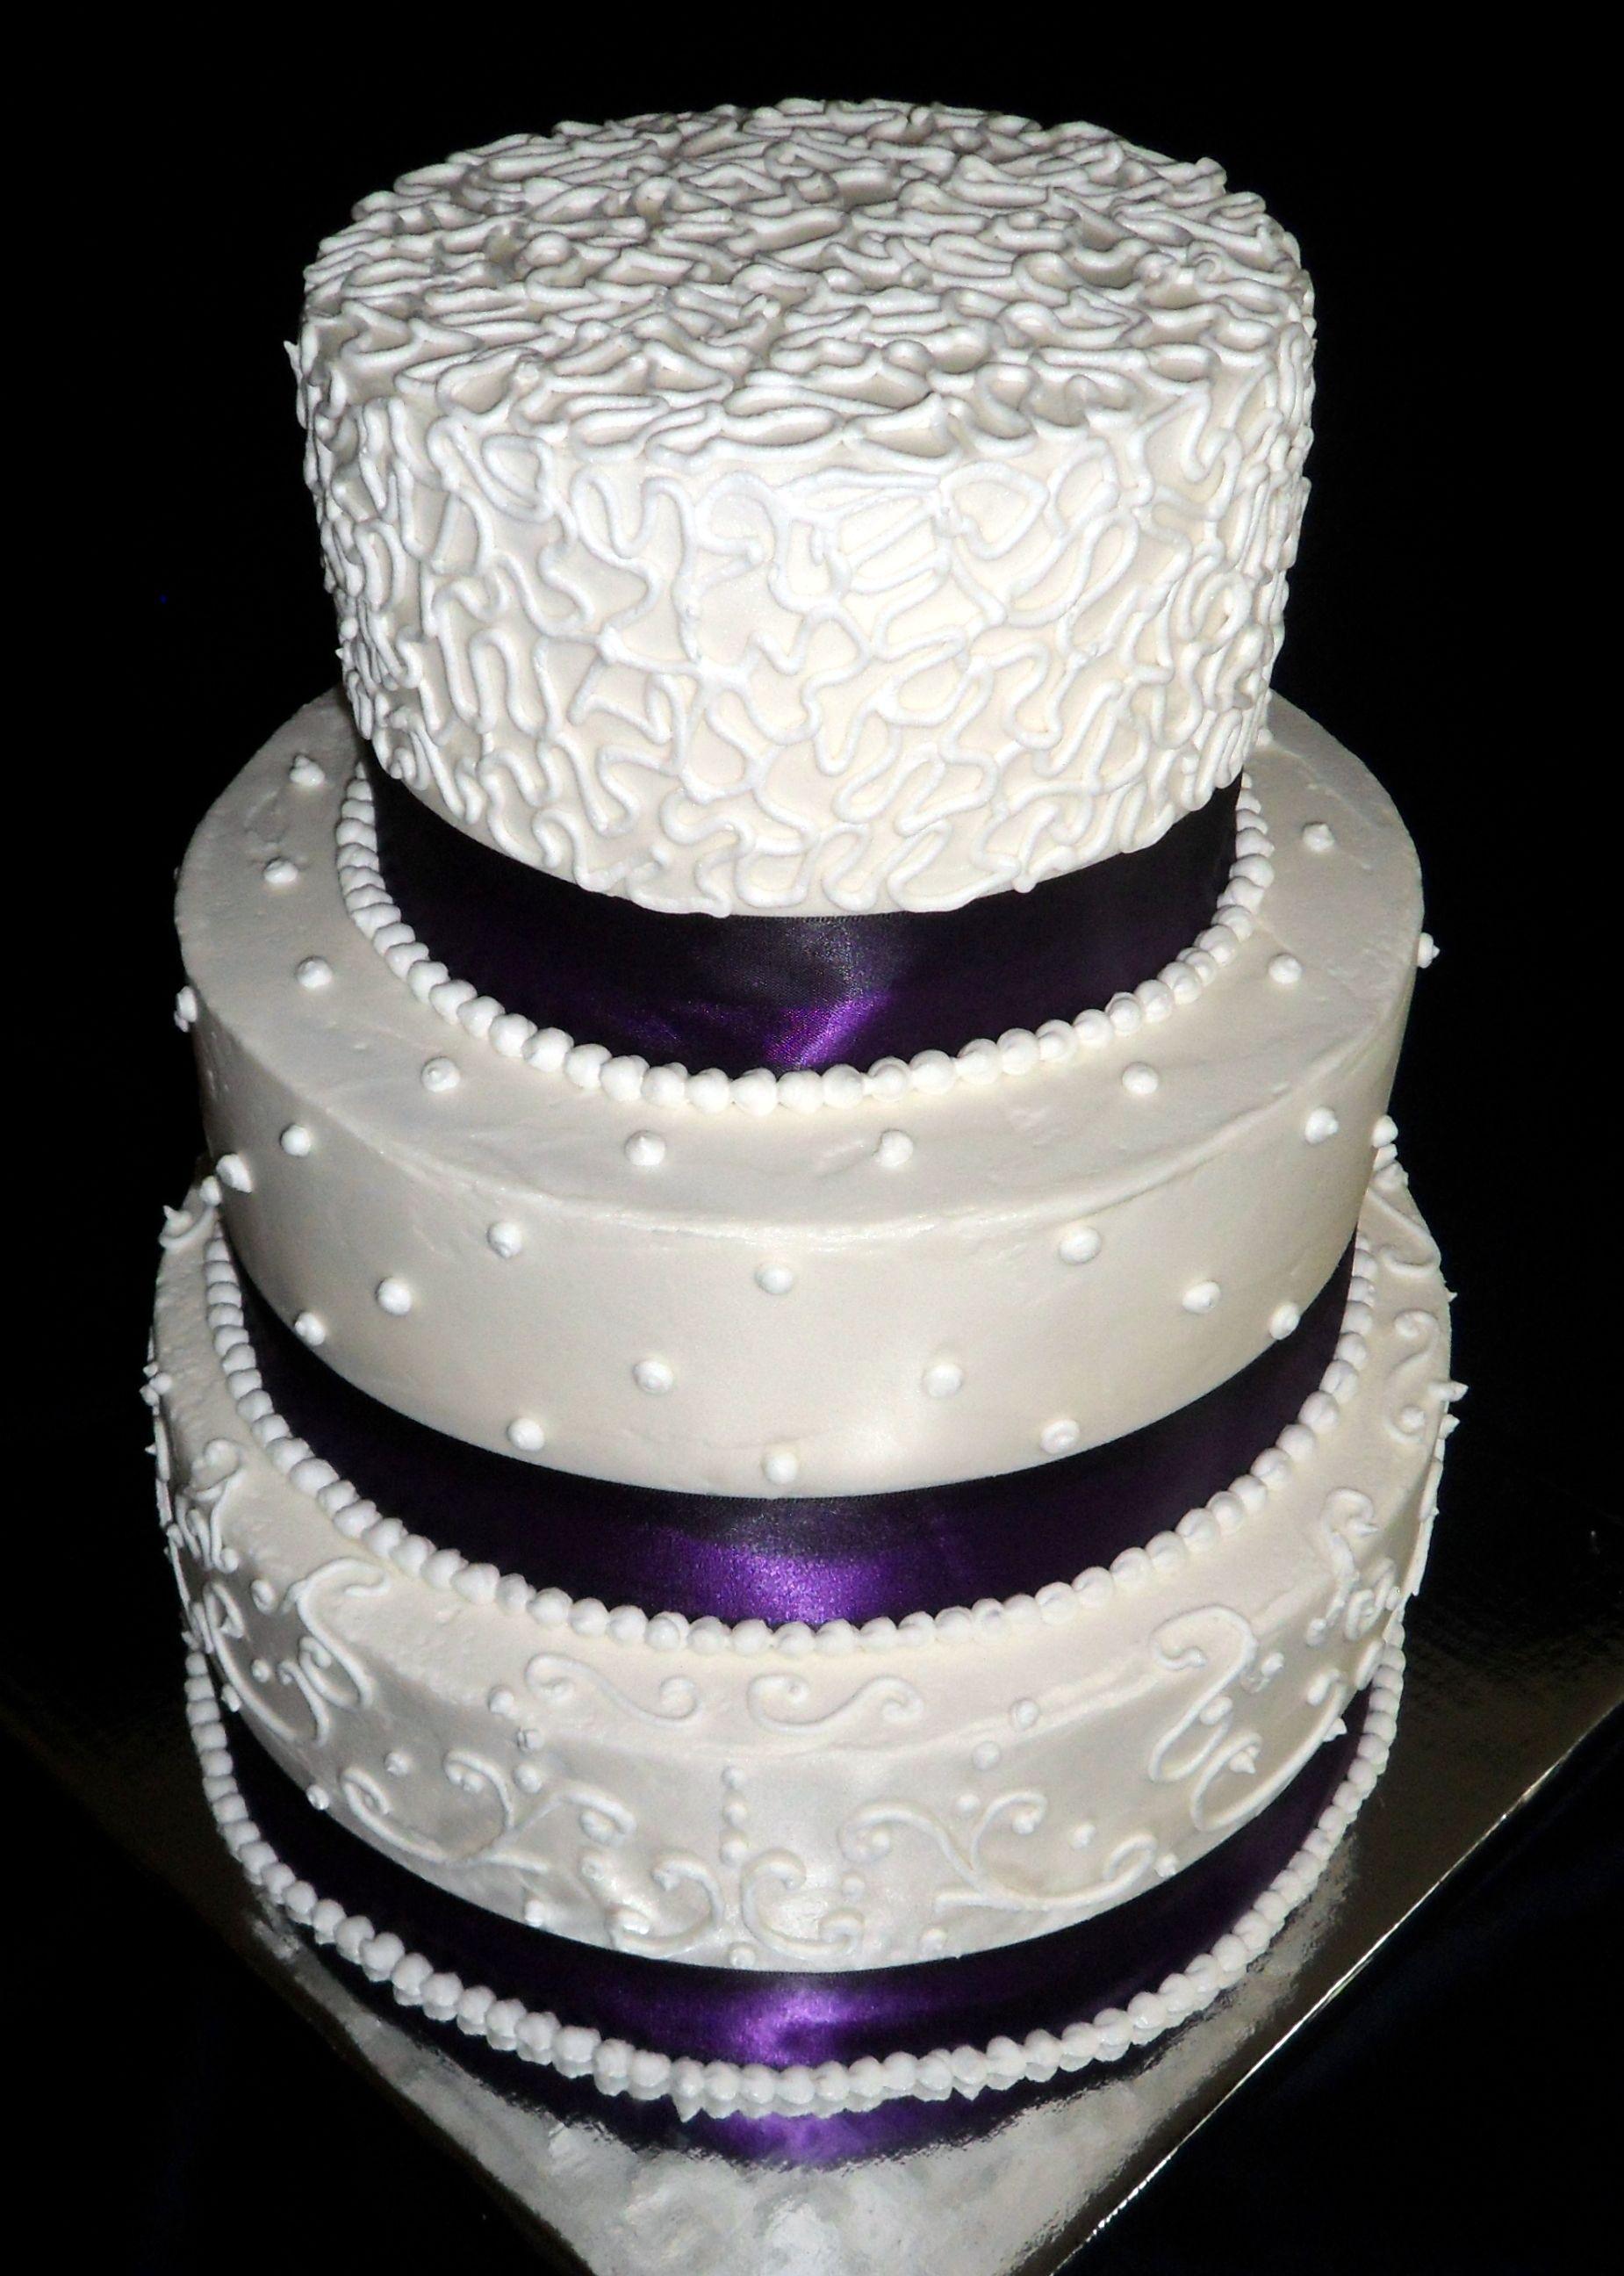 Buttercream Wedding Cake White buttercream, Round